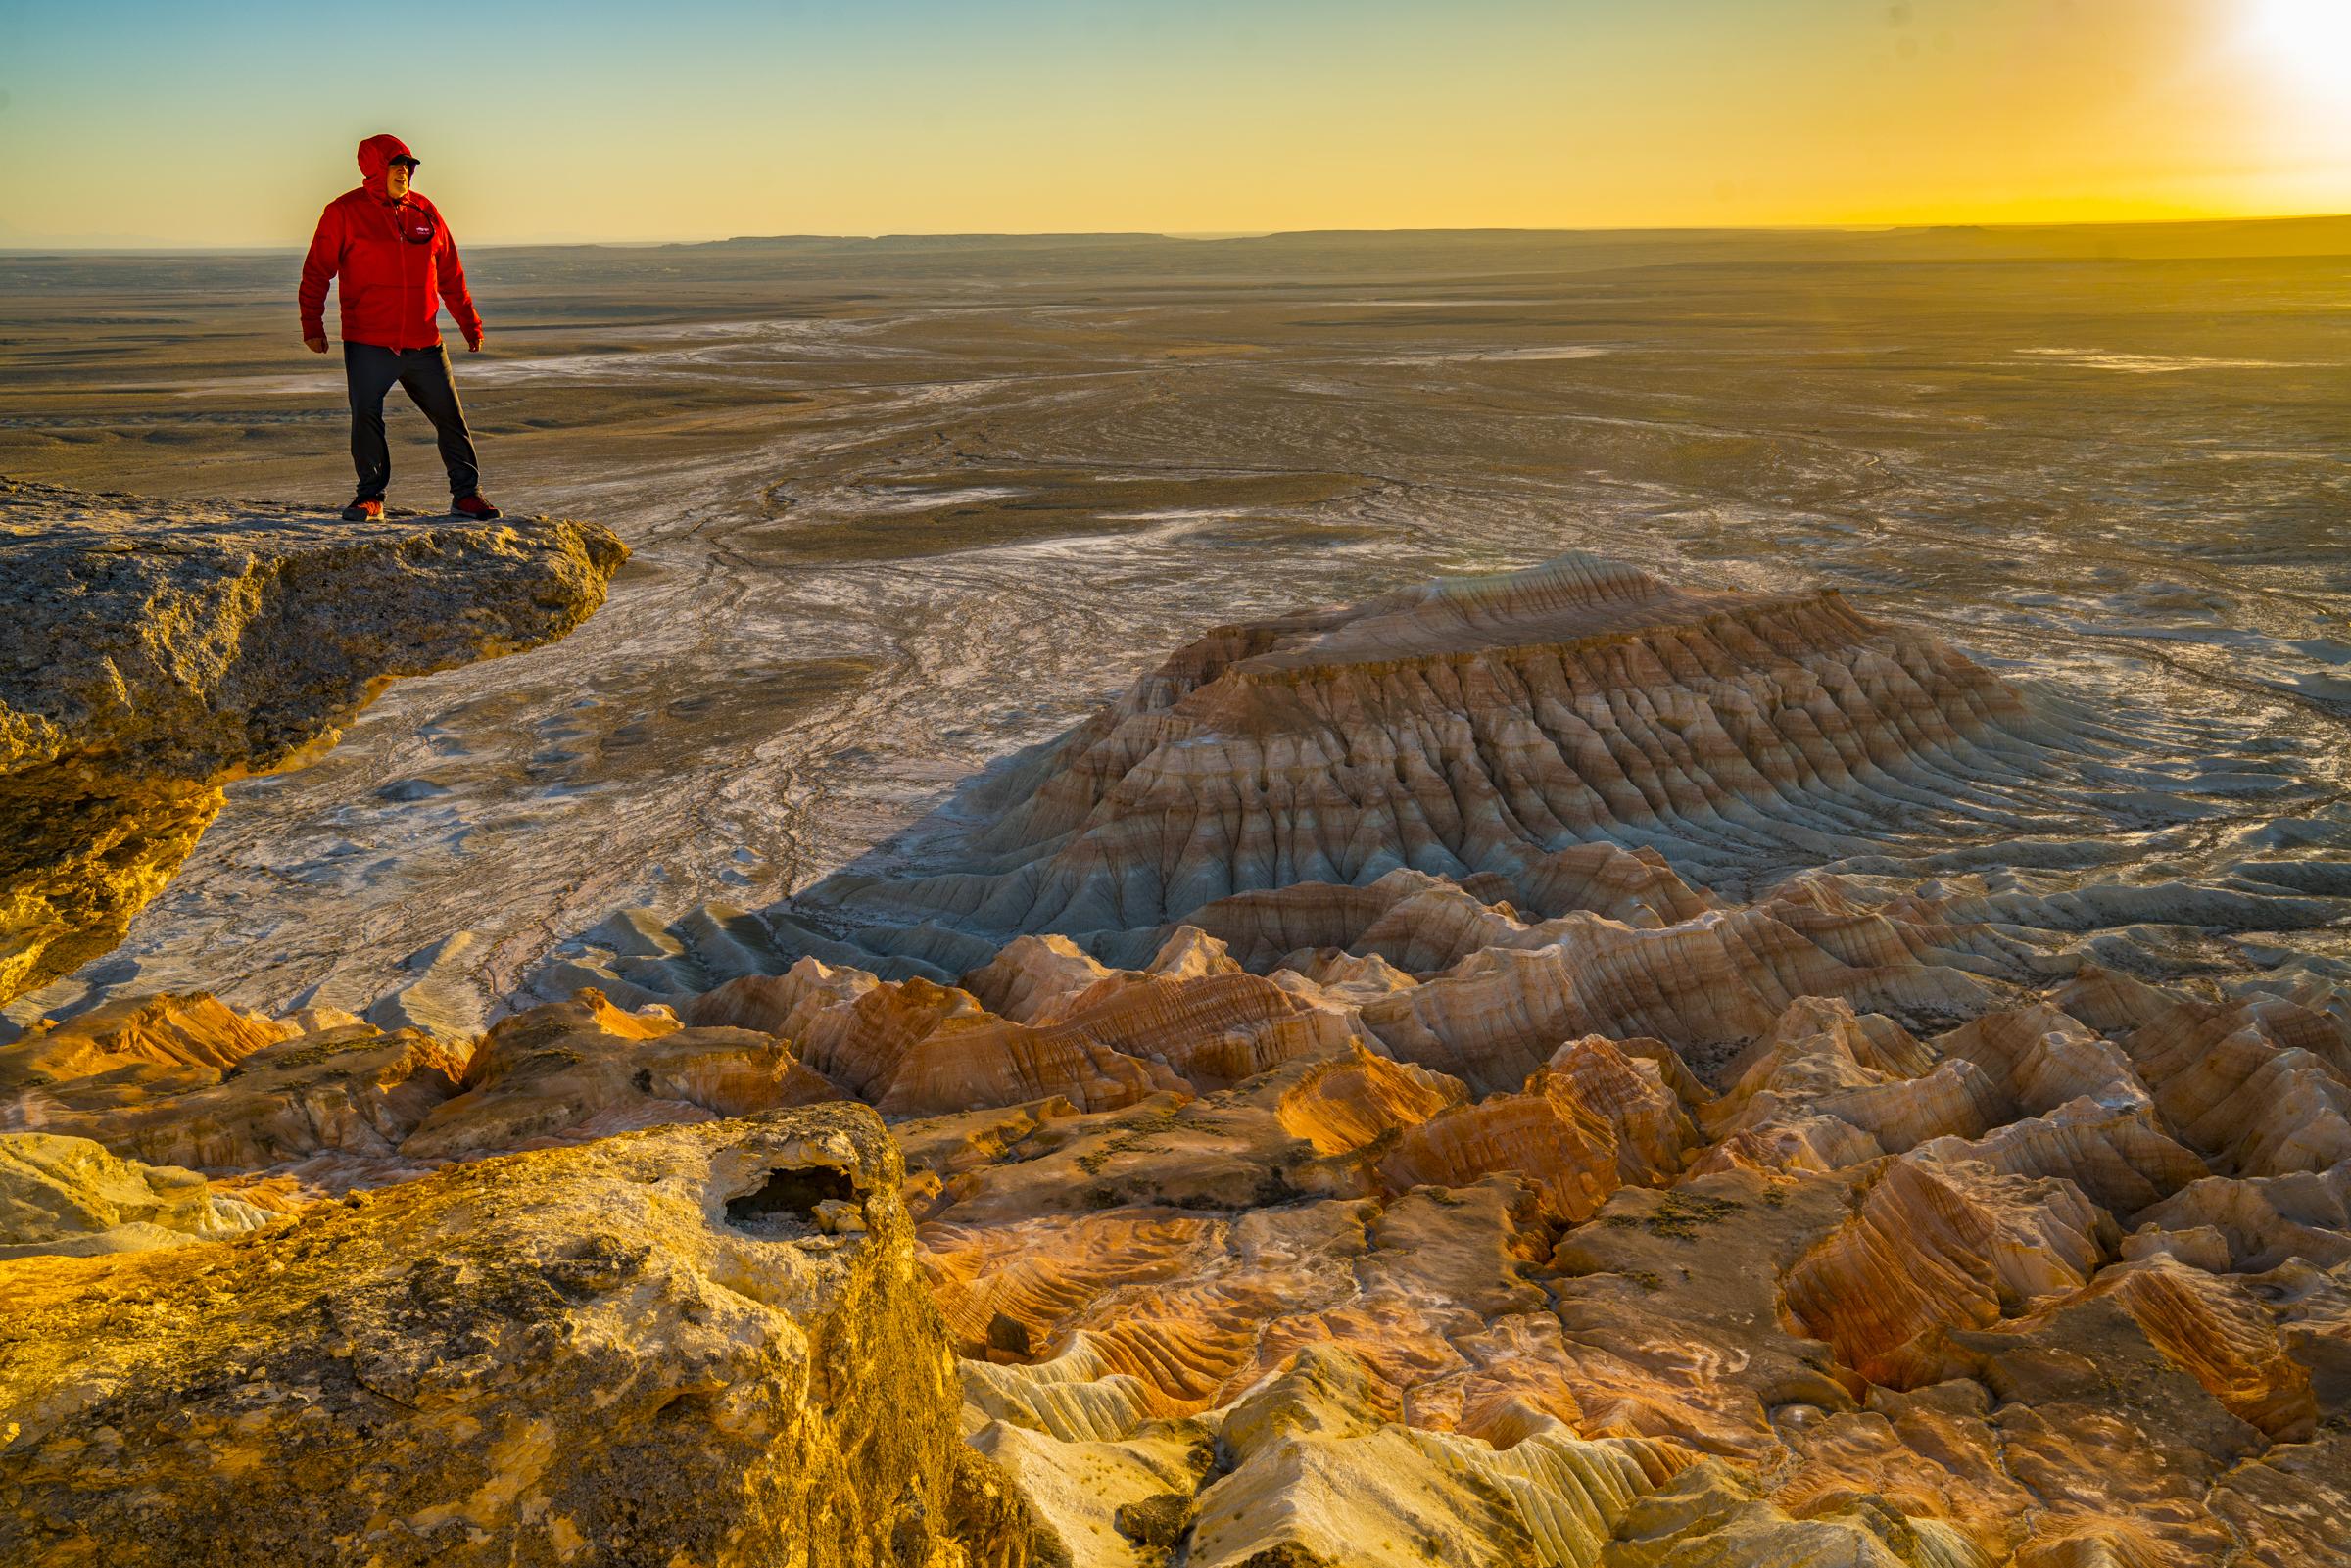 Hiker on precipce above Yangikala Canyon, Turkmenistan photographed by Tom Till